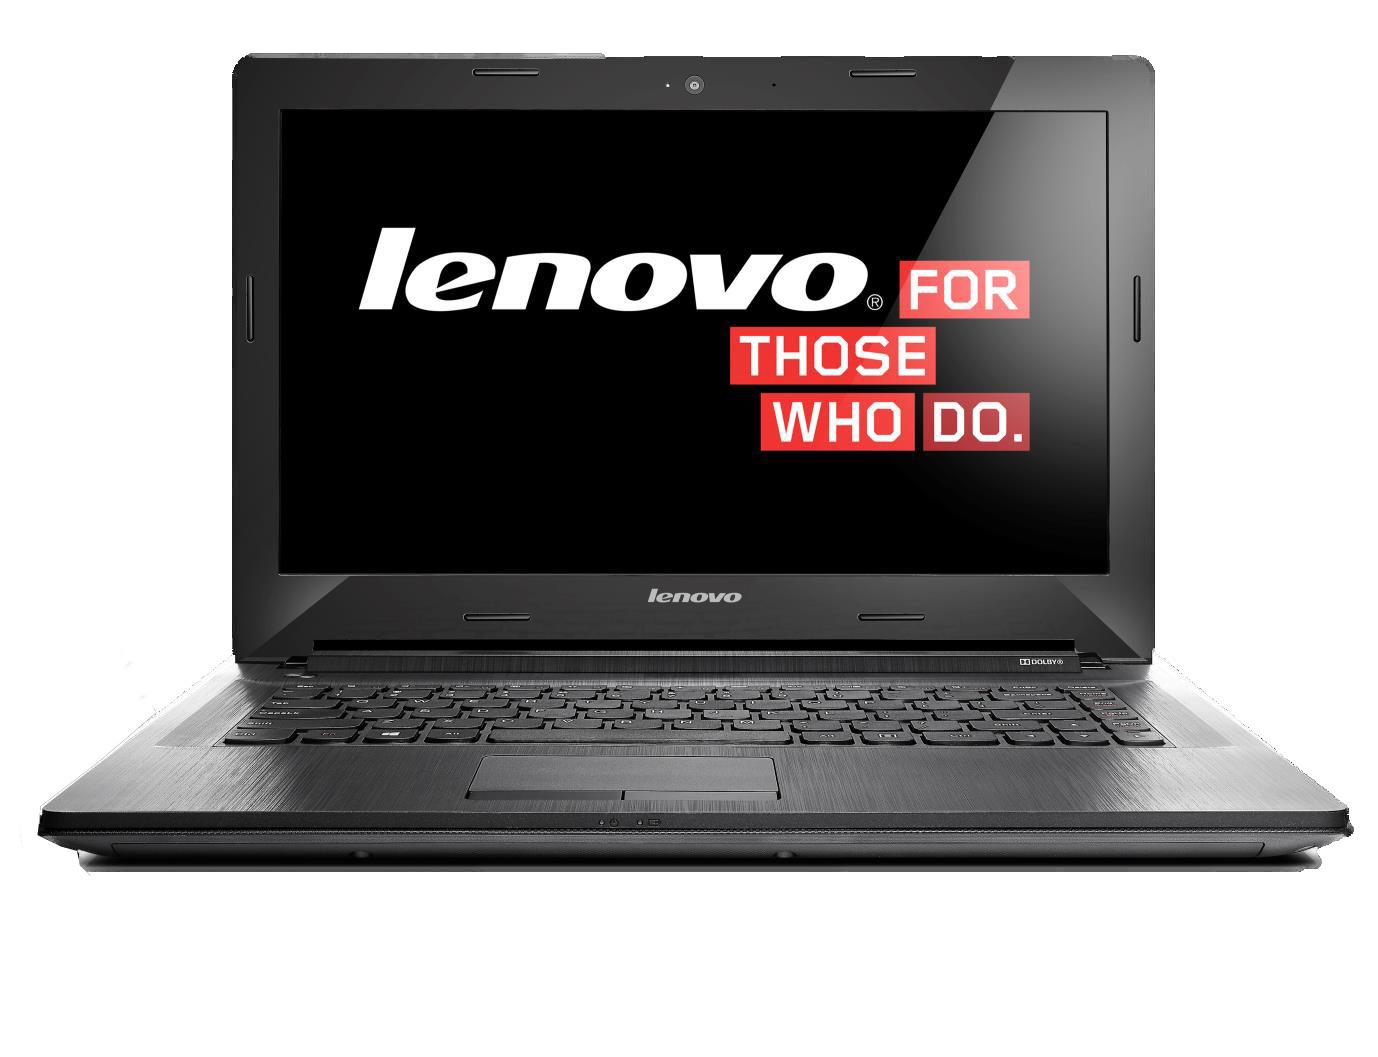 "Lenovo G50-30 15,6""/N2830/160GB/4G/DVD/FHD/Win8.1"